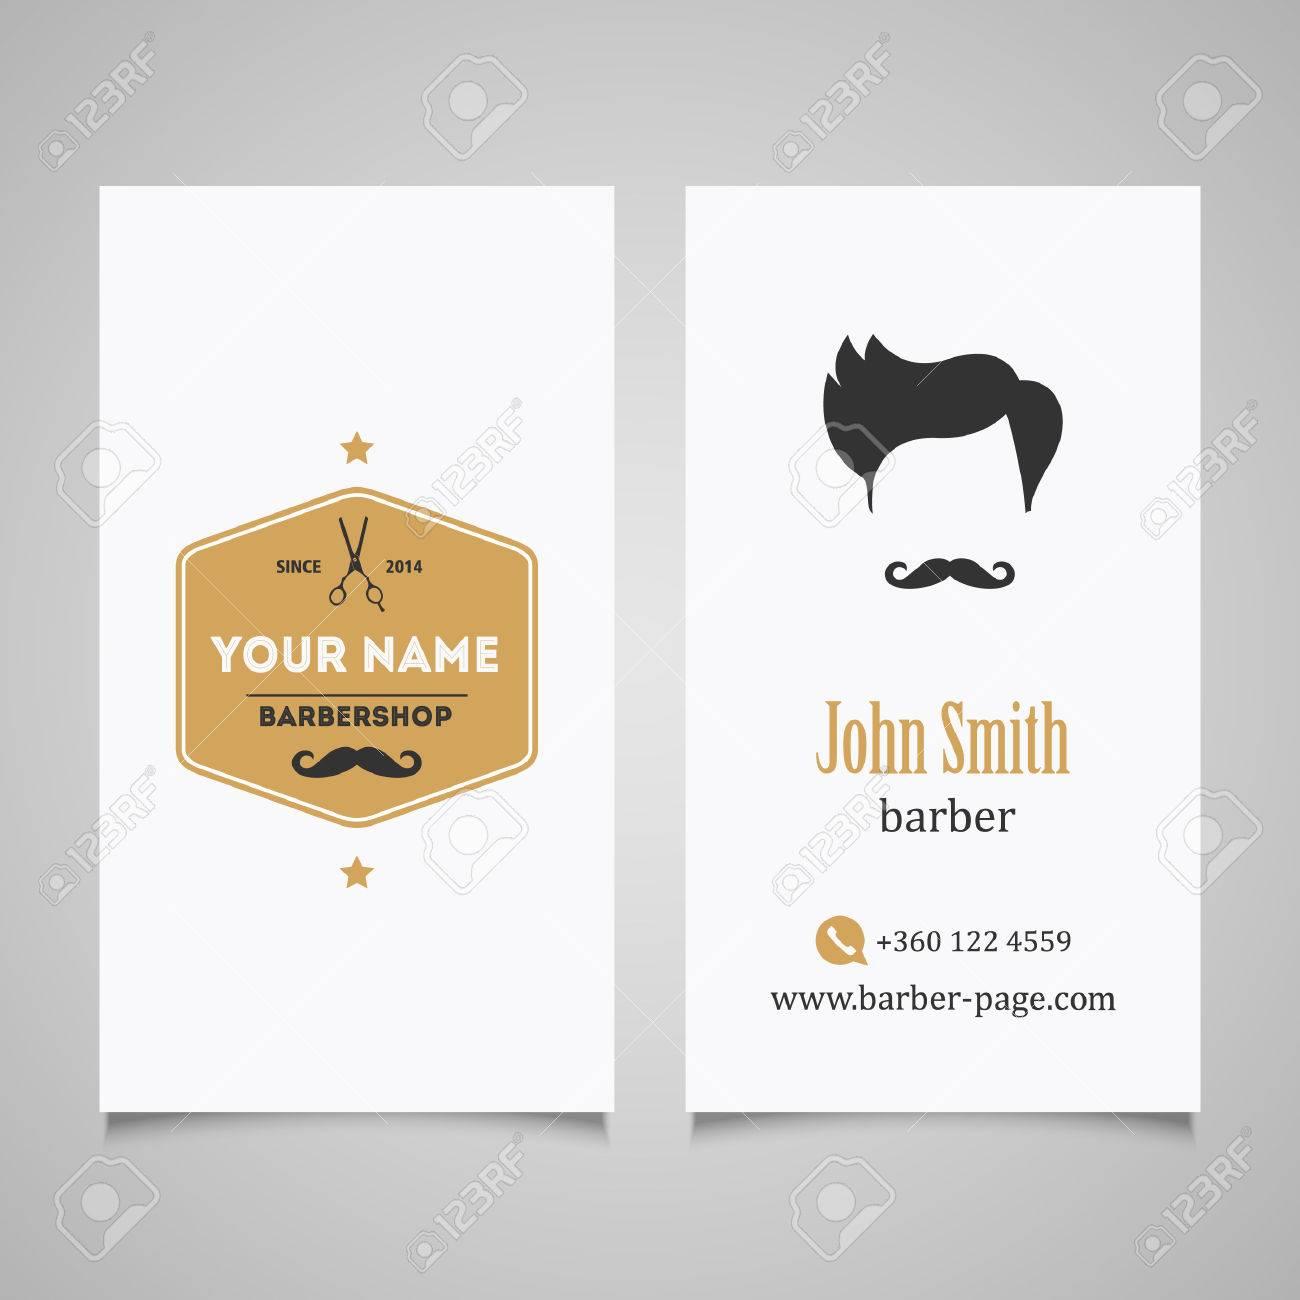 Hair salon barber shop business card design template royalty free hair salon barber shop business card design template stock vector 41643341 wajeb Choice Image